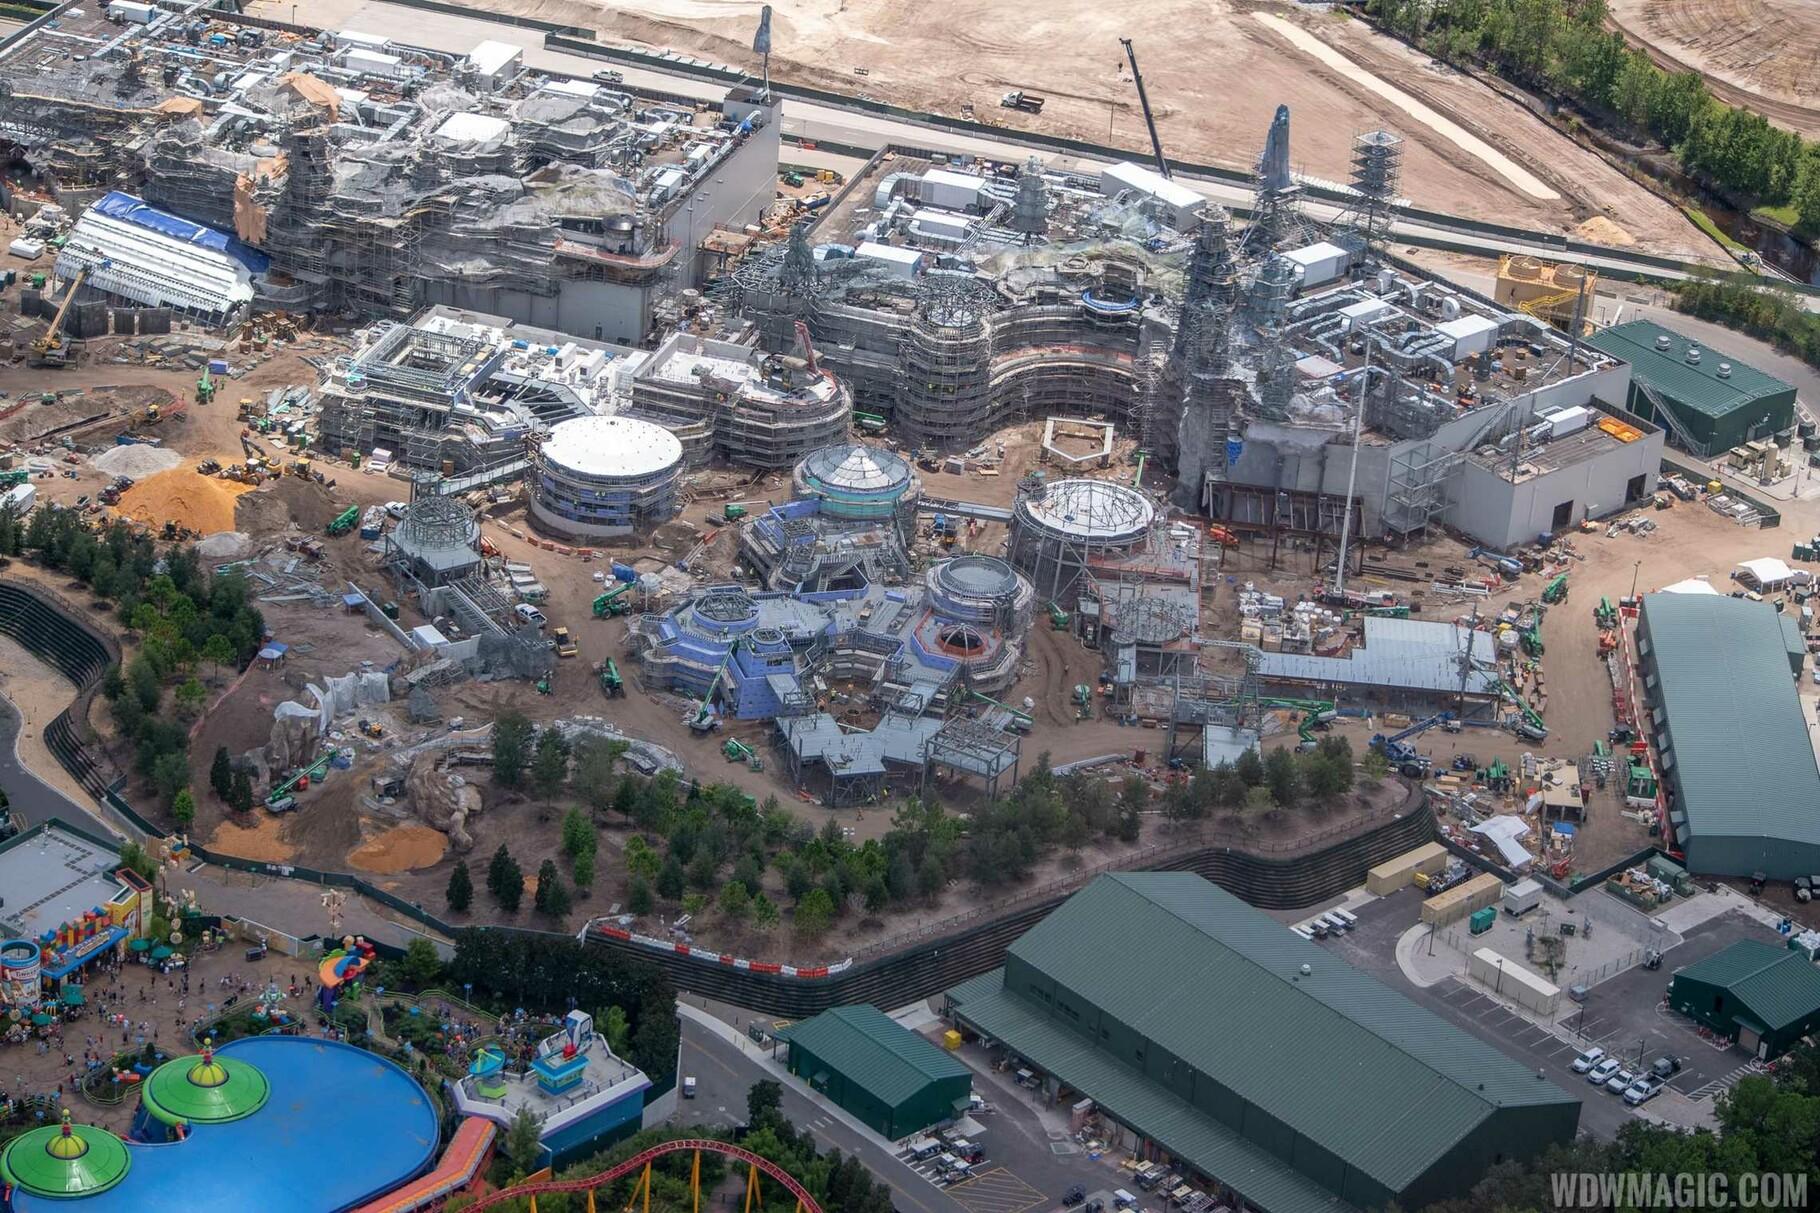 Pildiotsingu orlando theme parks aerophoto tulemus